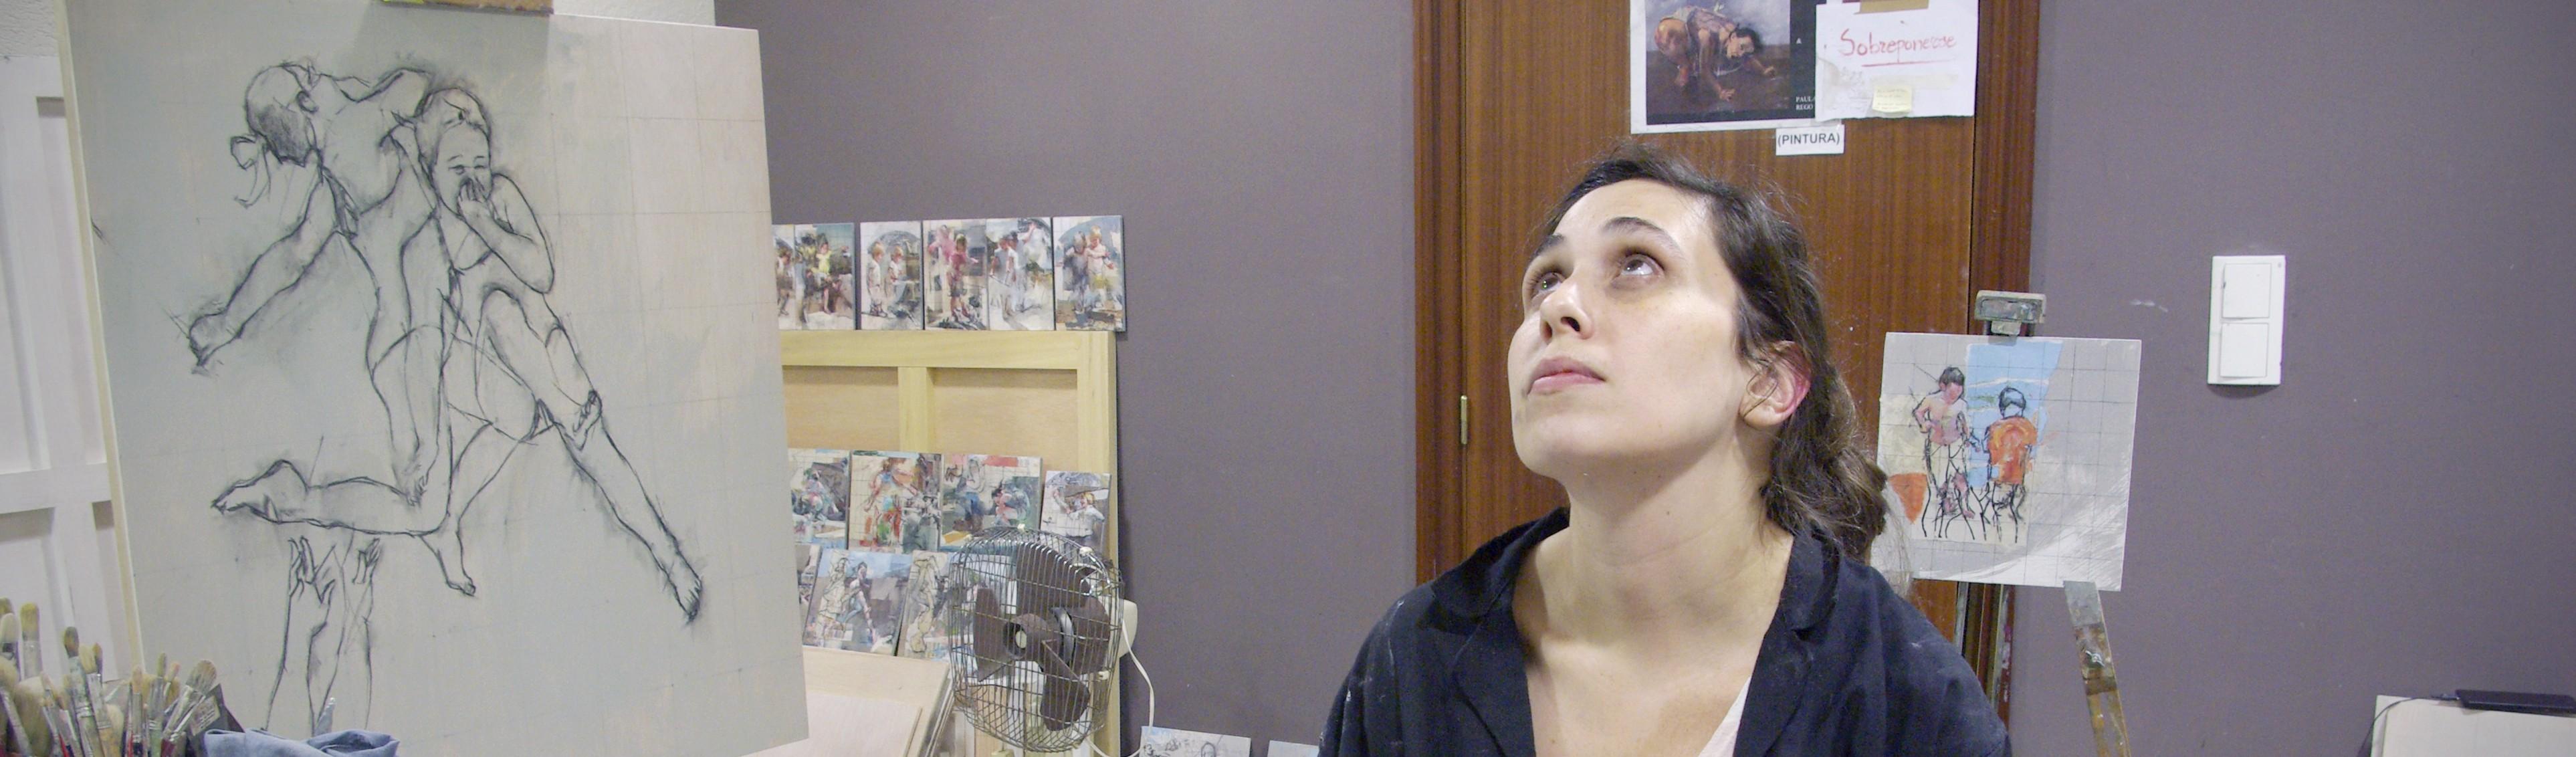 Desde mi taller: Pilar López Báez